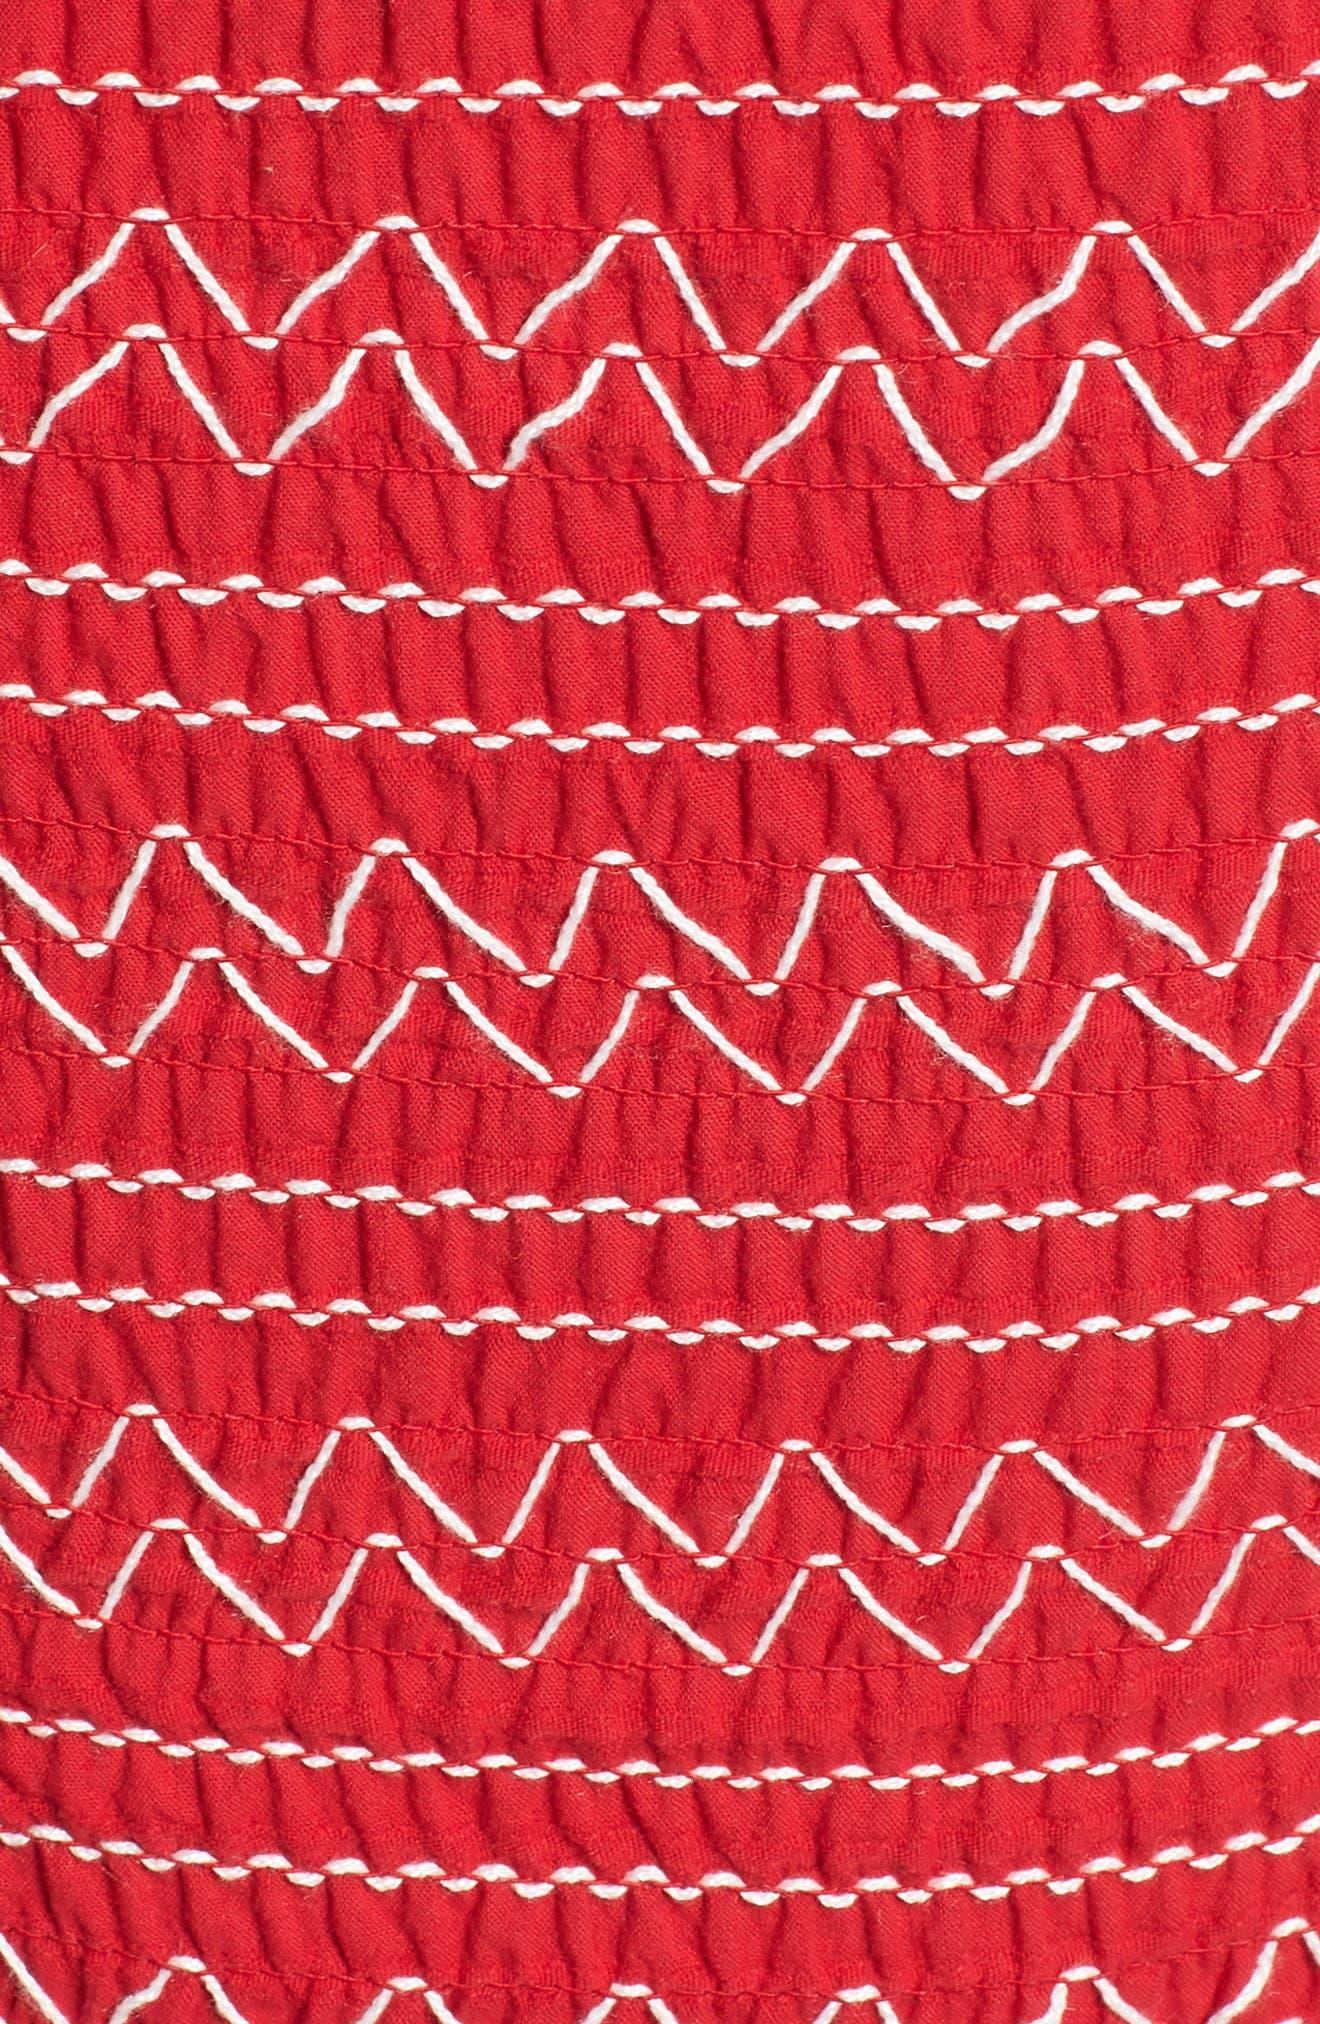 Riverine Smock Strapless Top,                             Alternate thumbnail 6, color,                             600